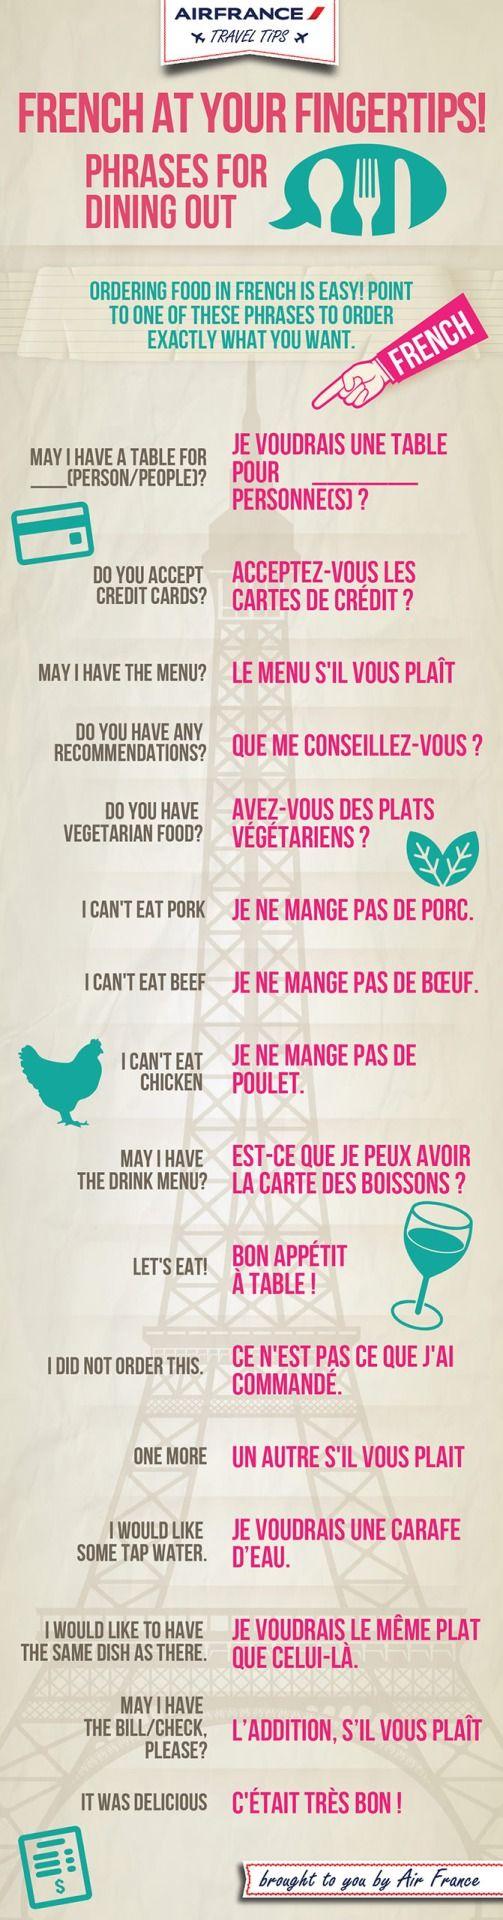 Parlons français au dîner au restaurant !